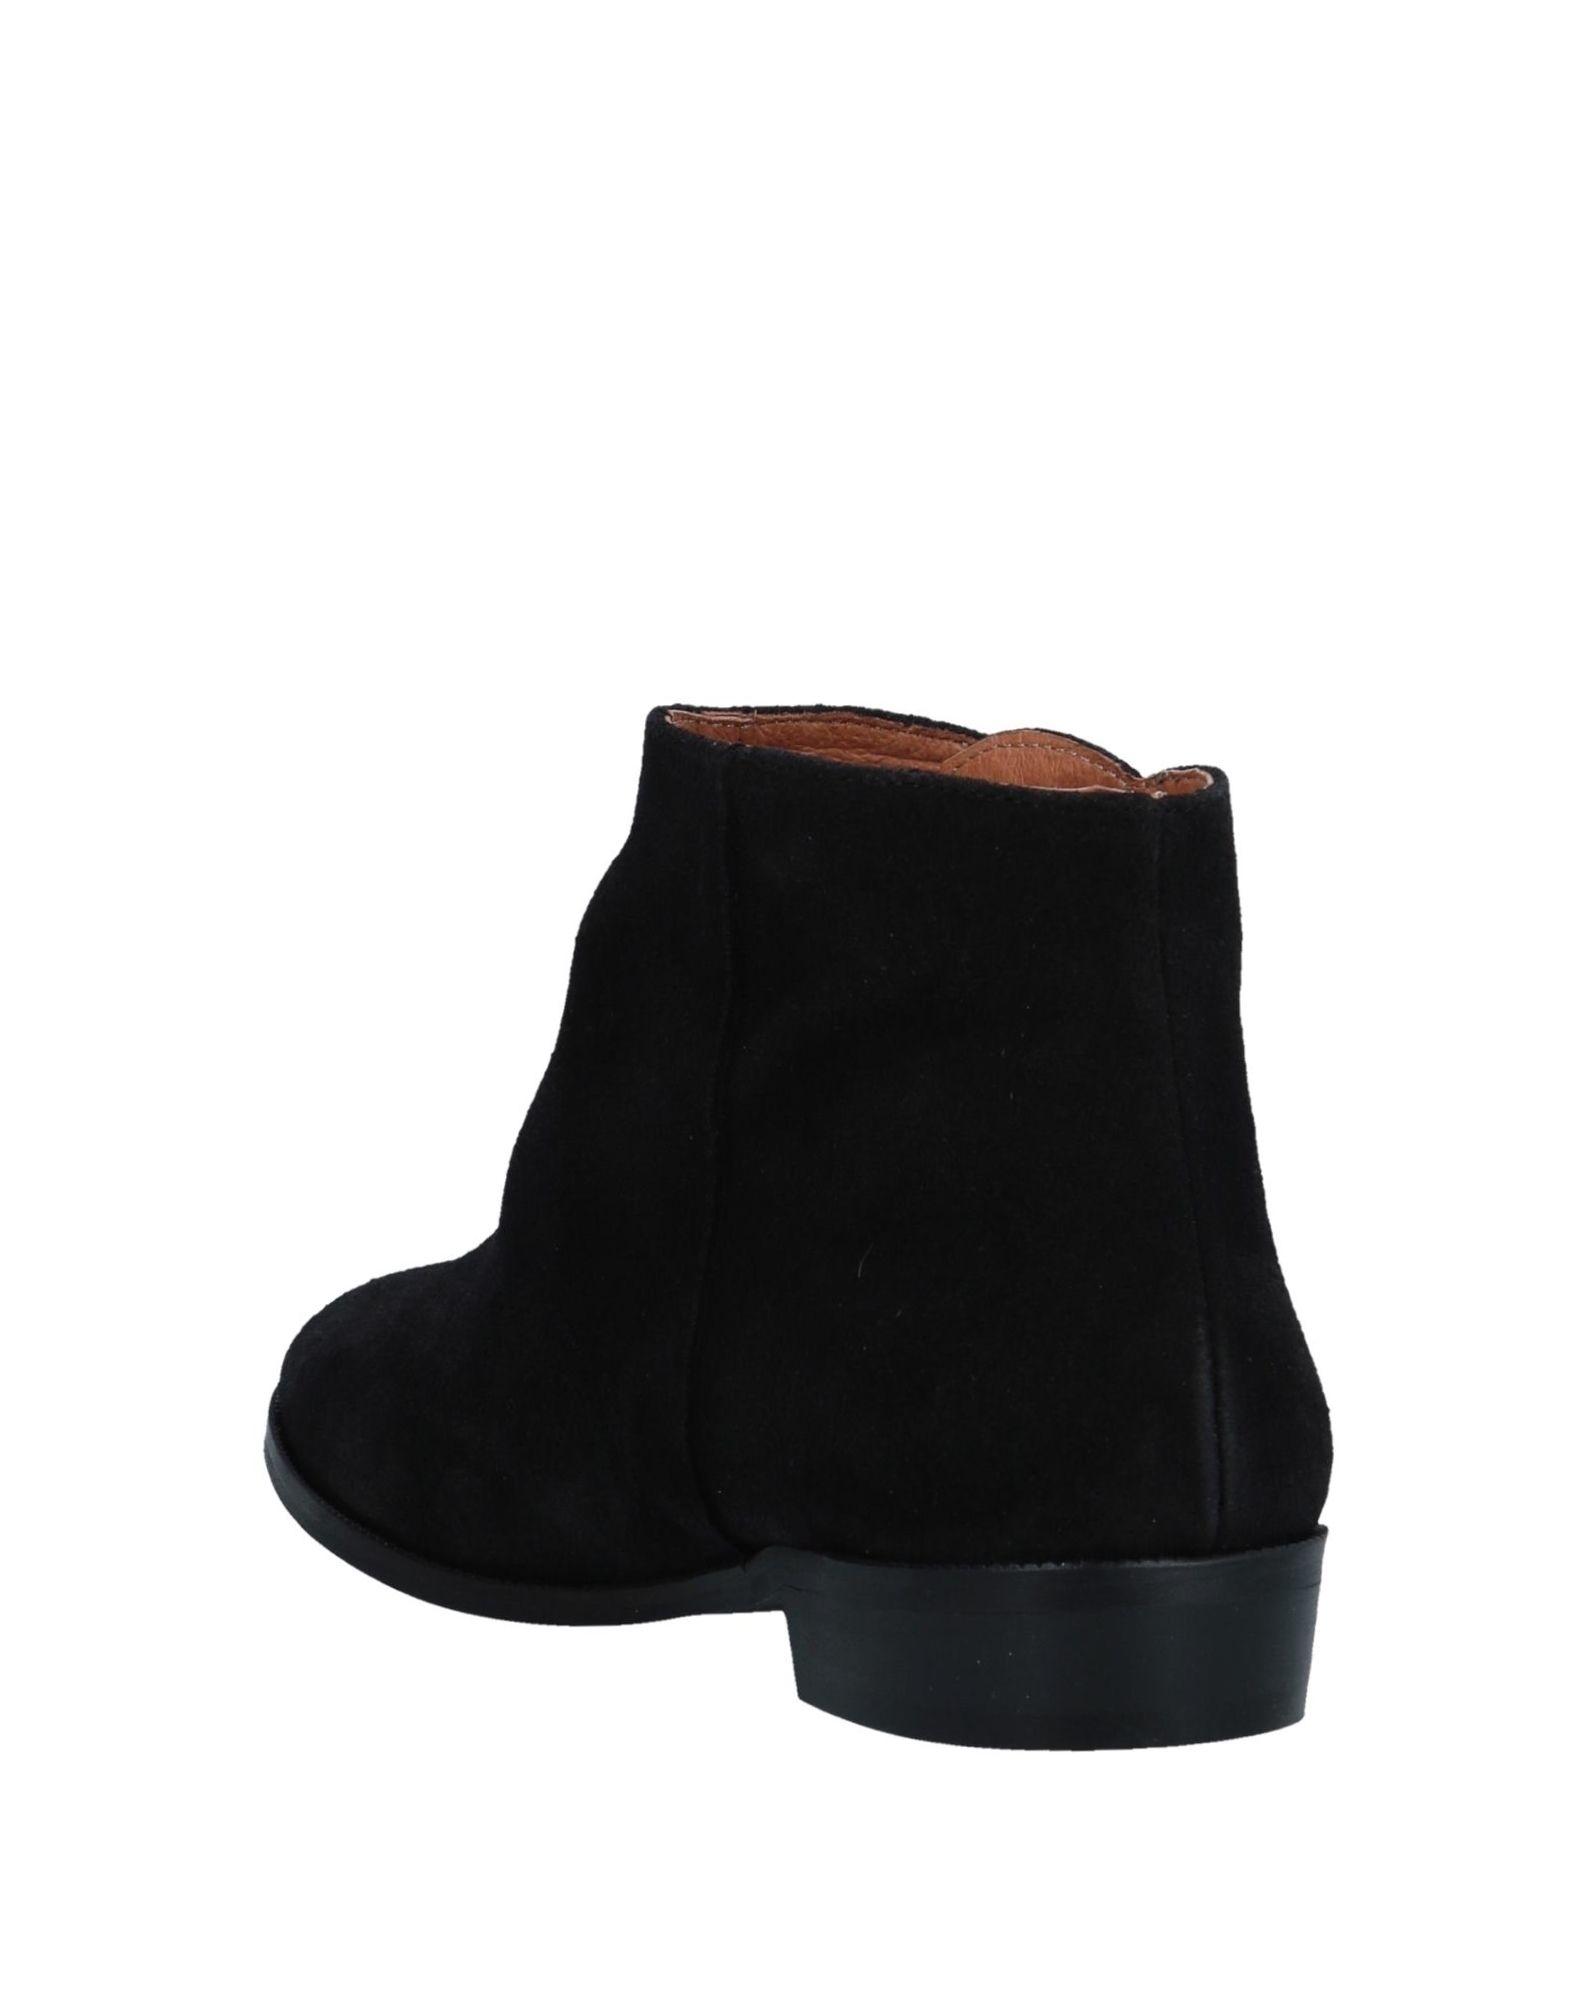 Stilvolle billige  Schuhe Apologie Stiefelette Damen  billige 11548381SQ 53e904